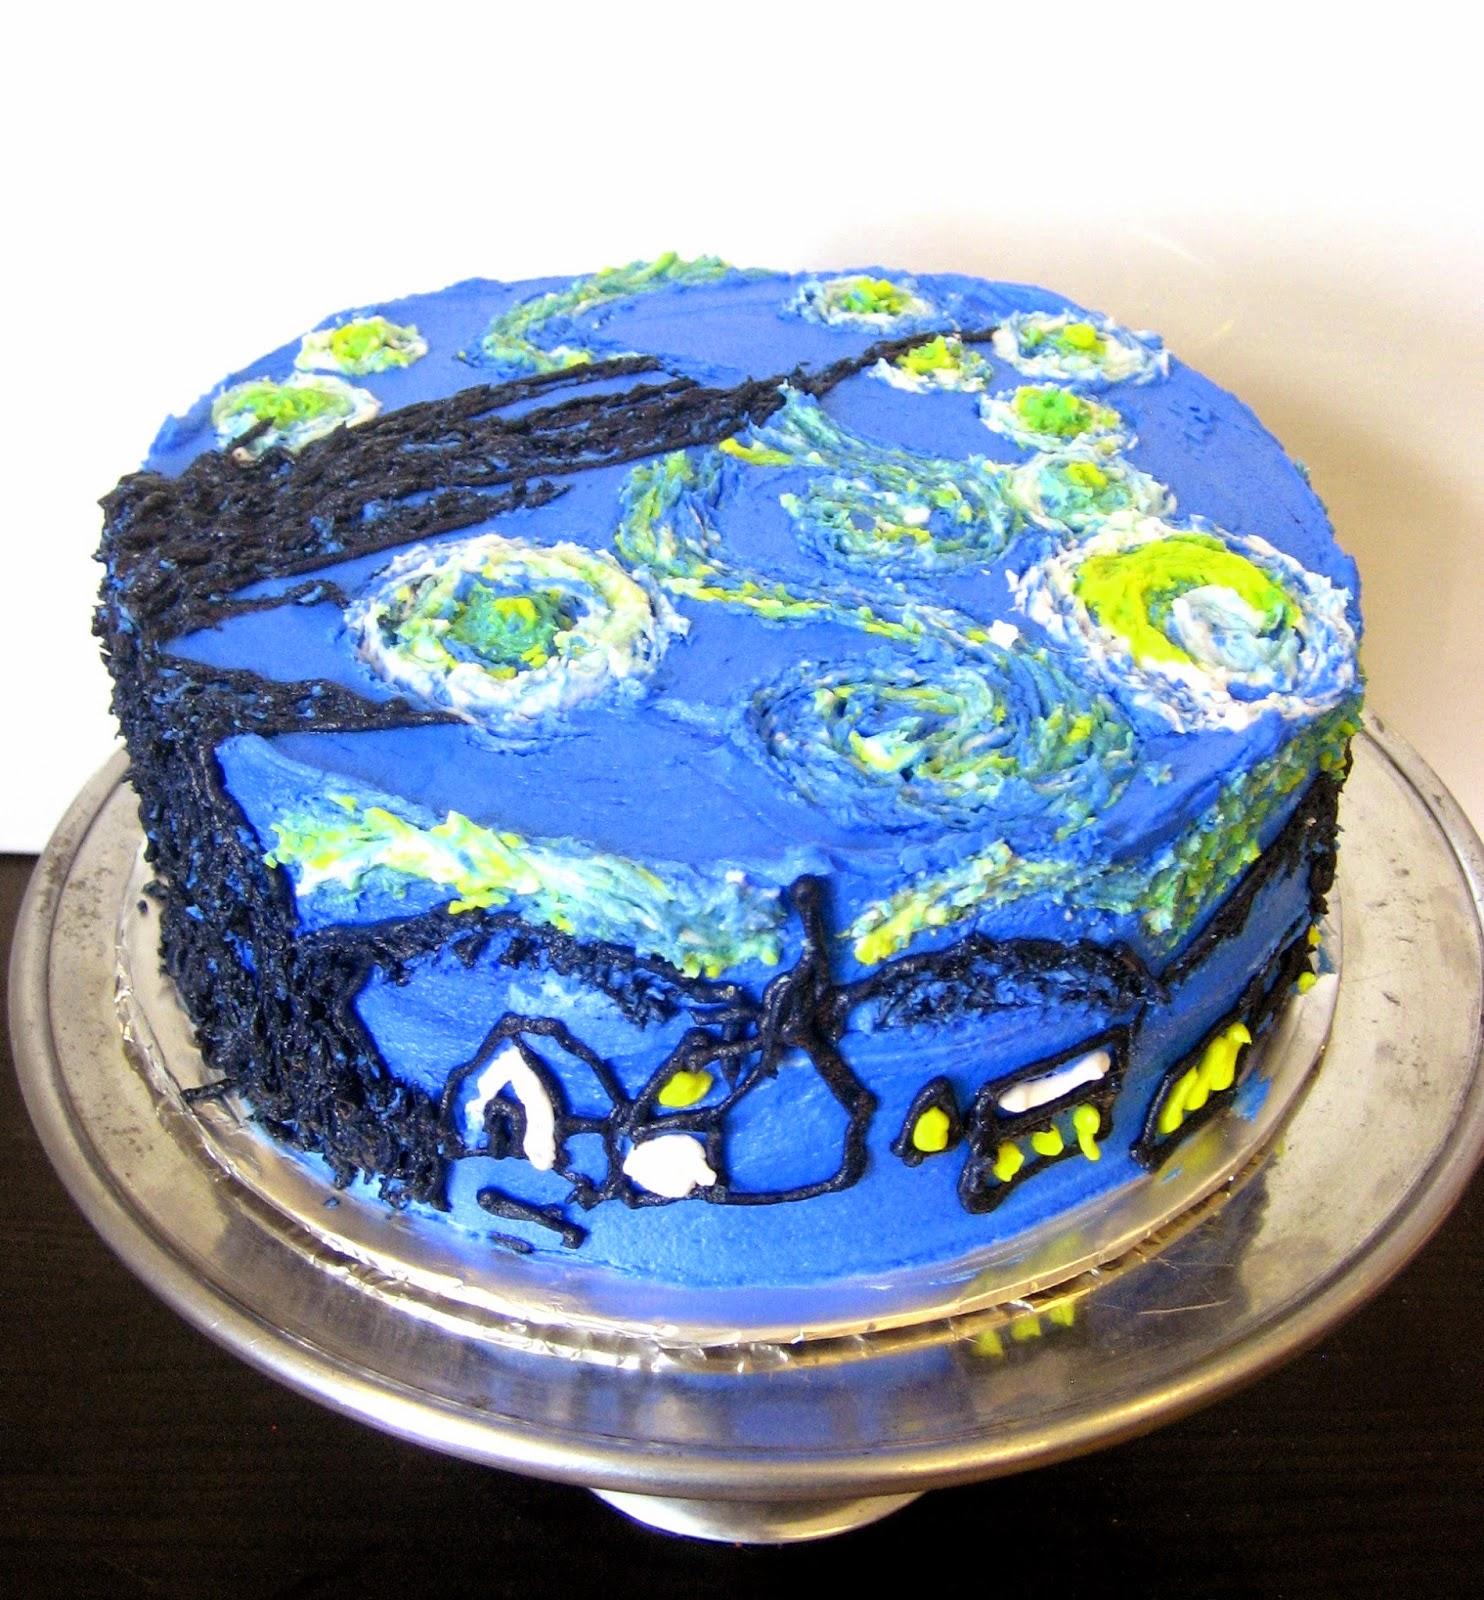 Asking For Donations For Cake Bake